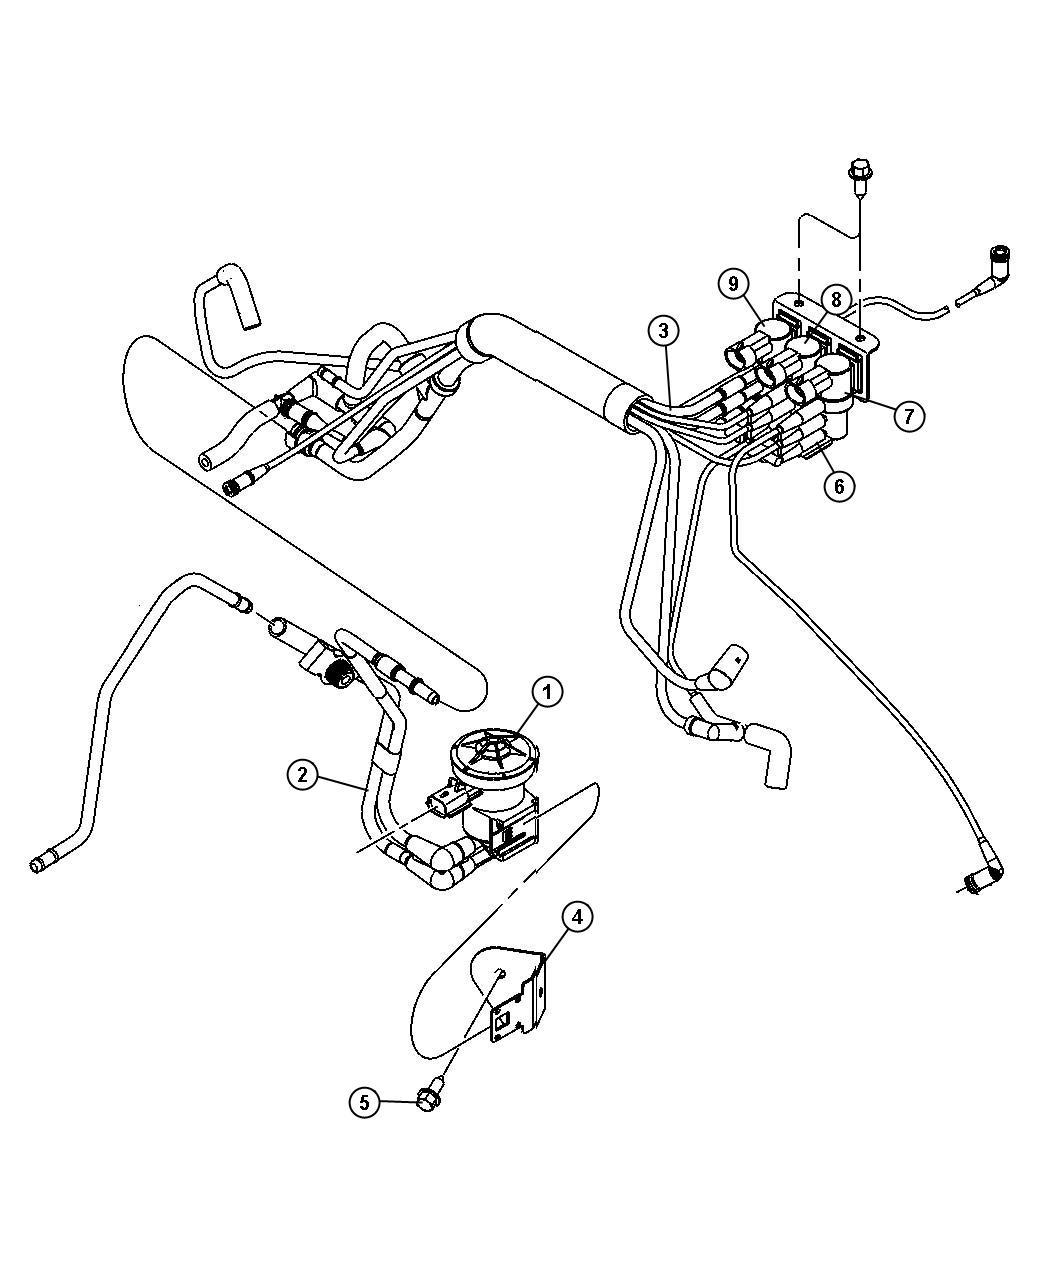 Dodge Stratus Solenoid. Proportional purge. Emission